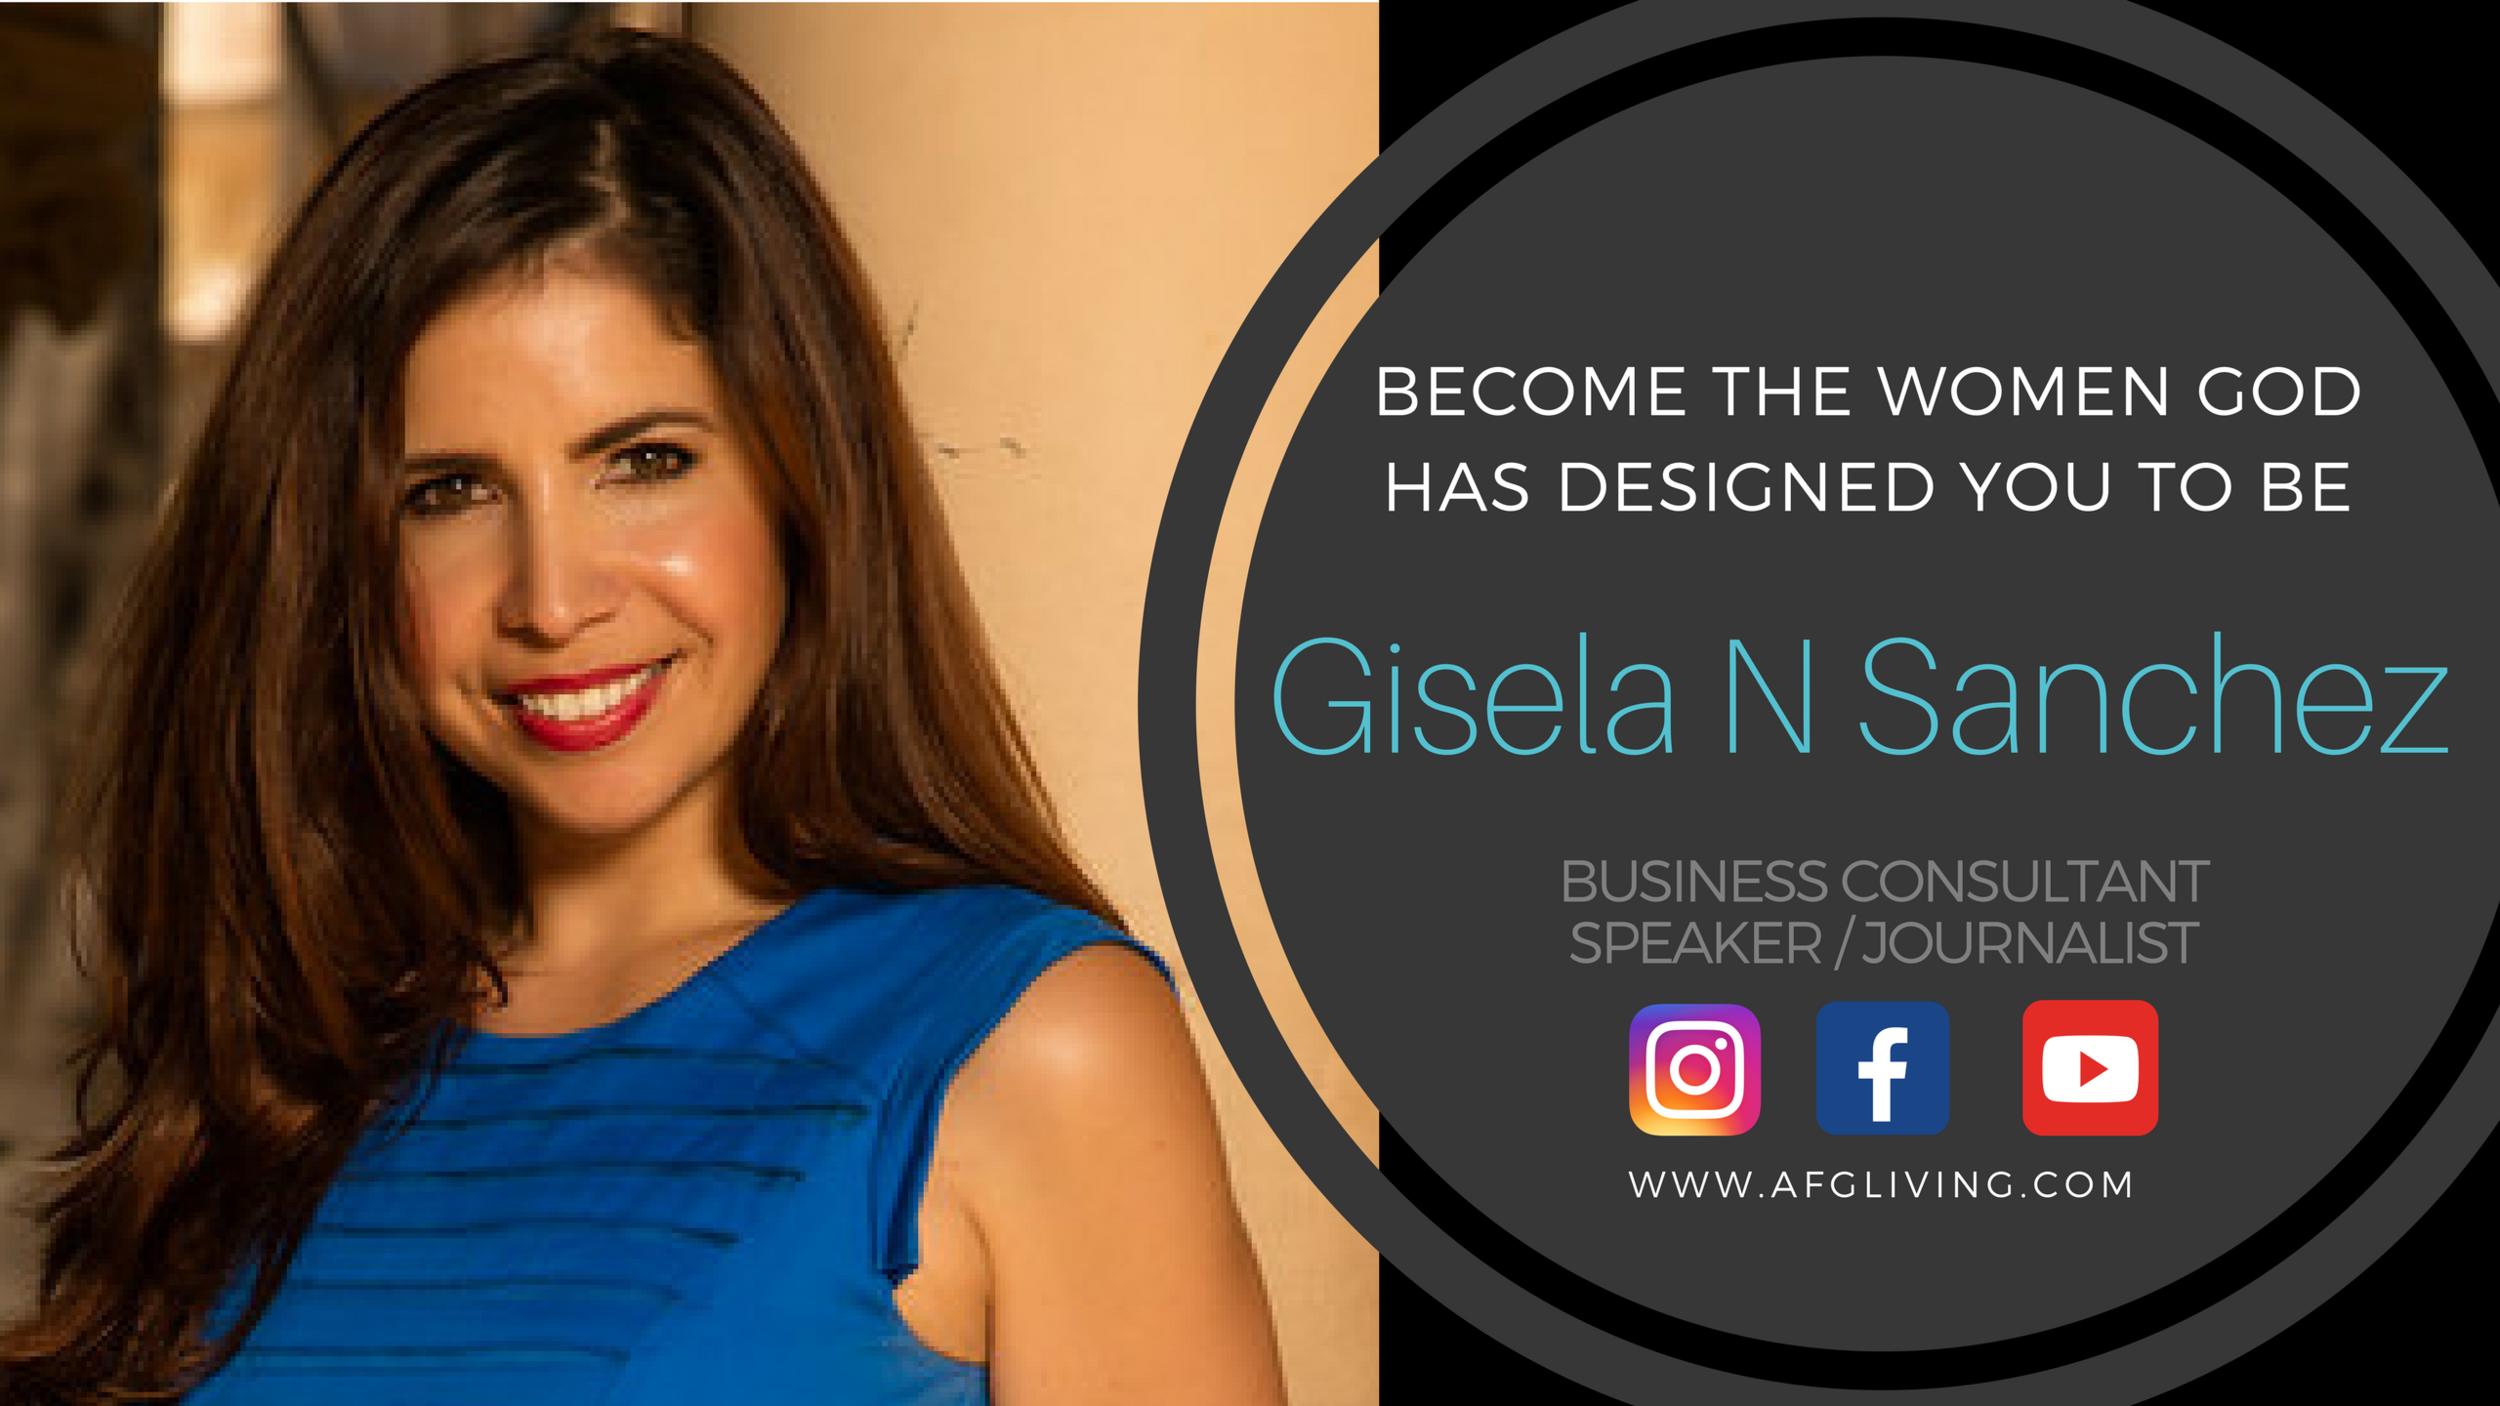 Gisela N Sanchez.png